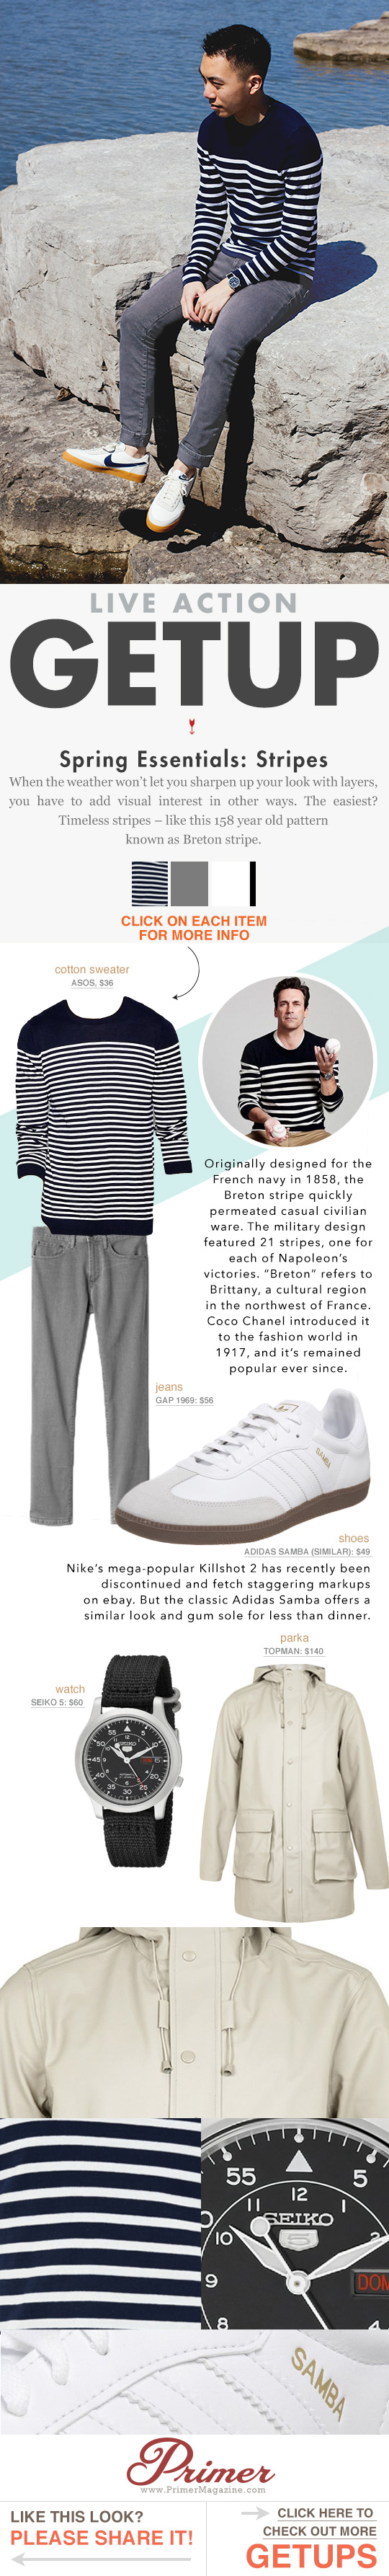 The Getup: Breton Stripe